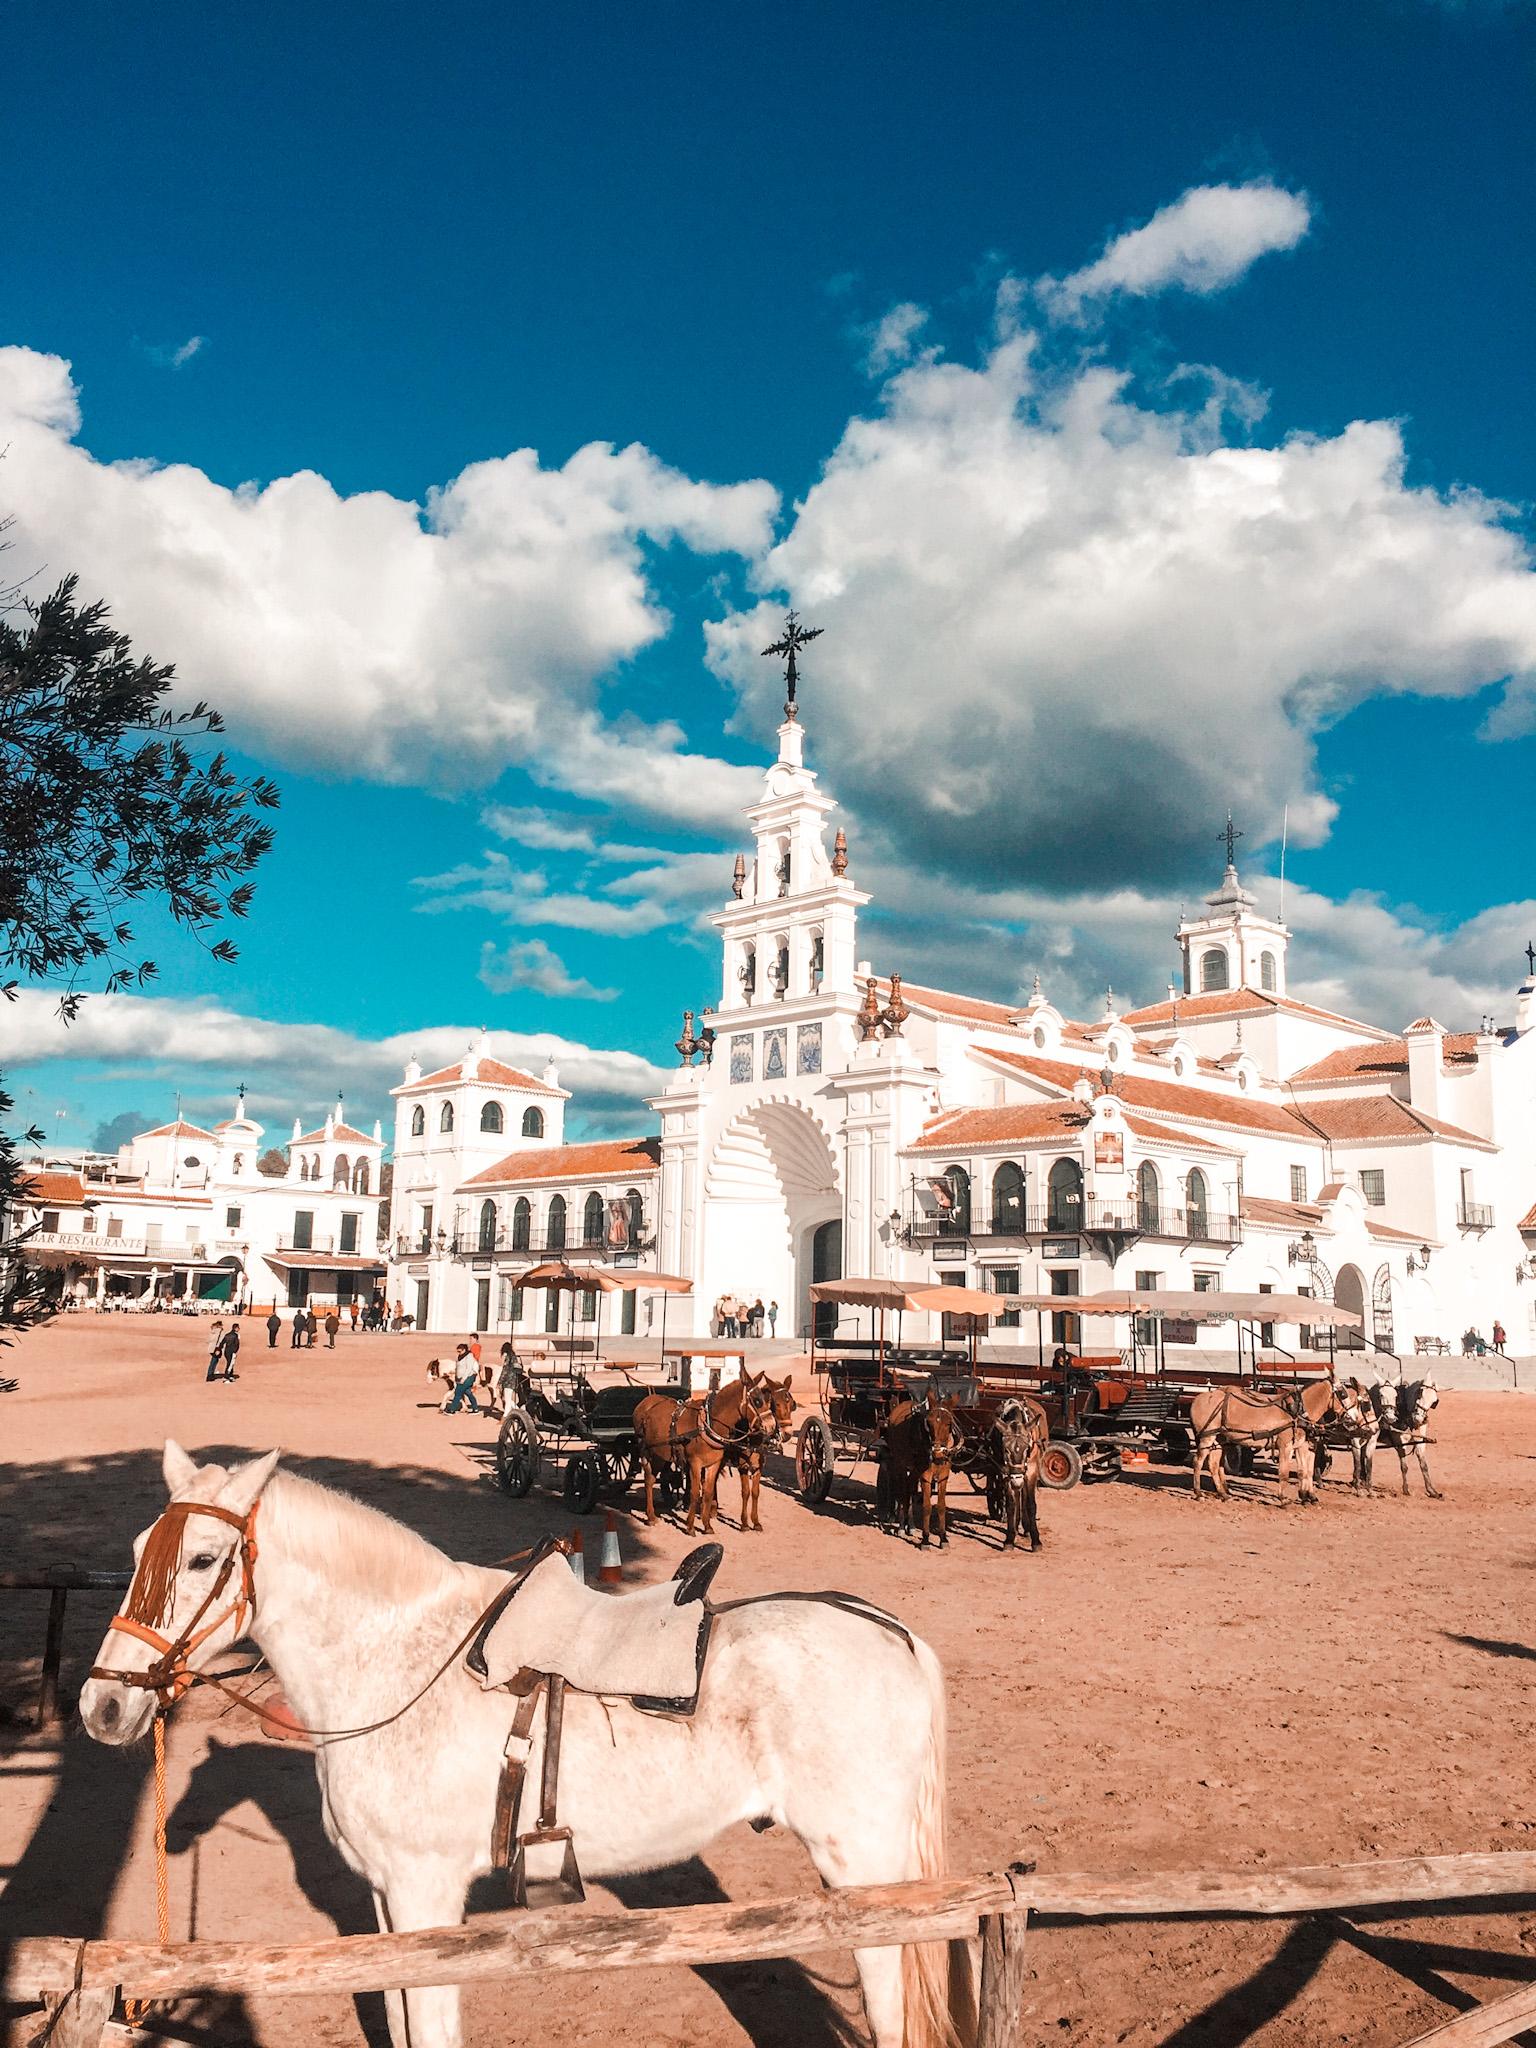 Zabezpieczone: Miasteczko El Rocio